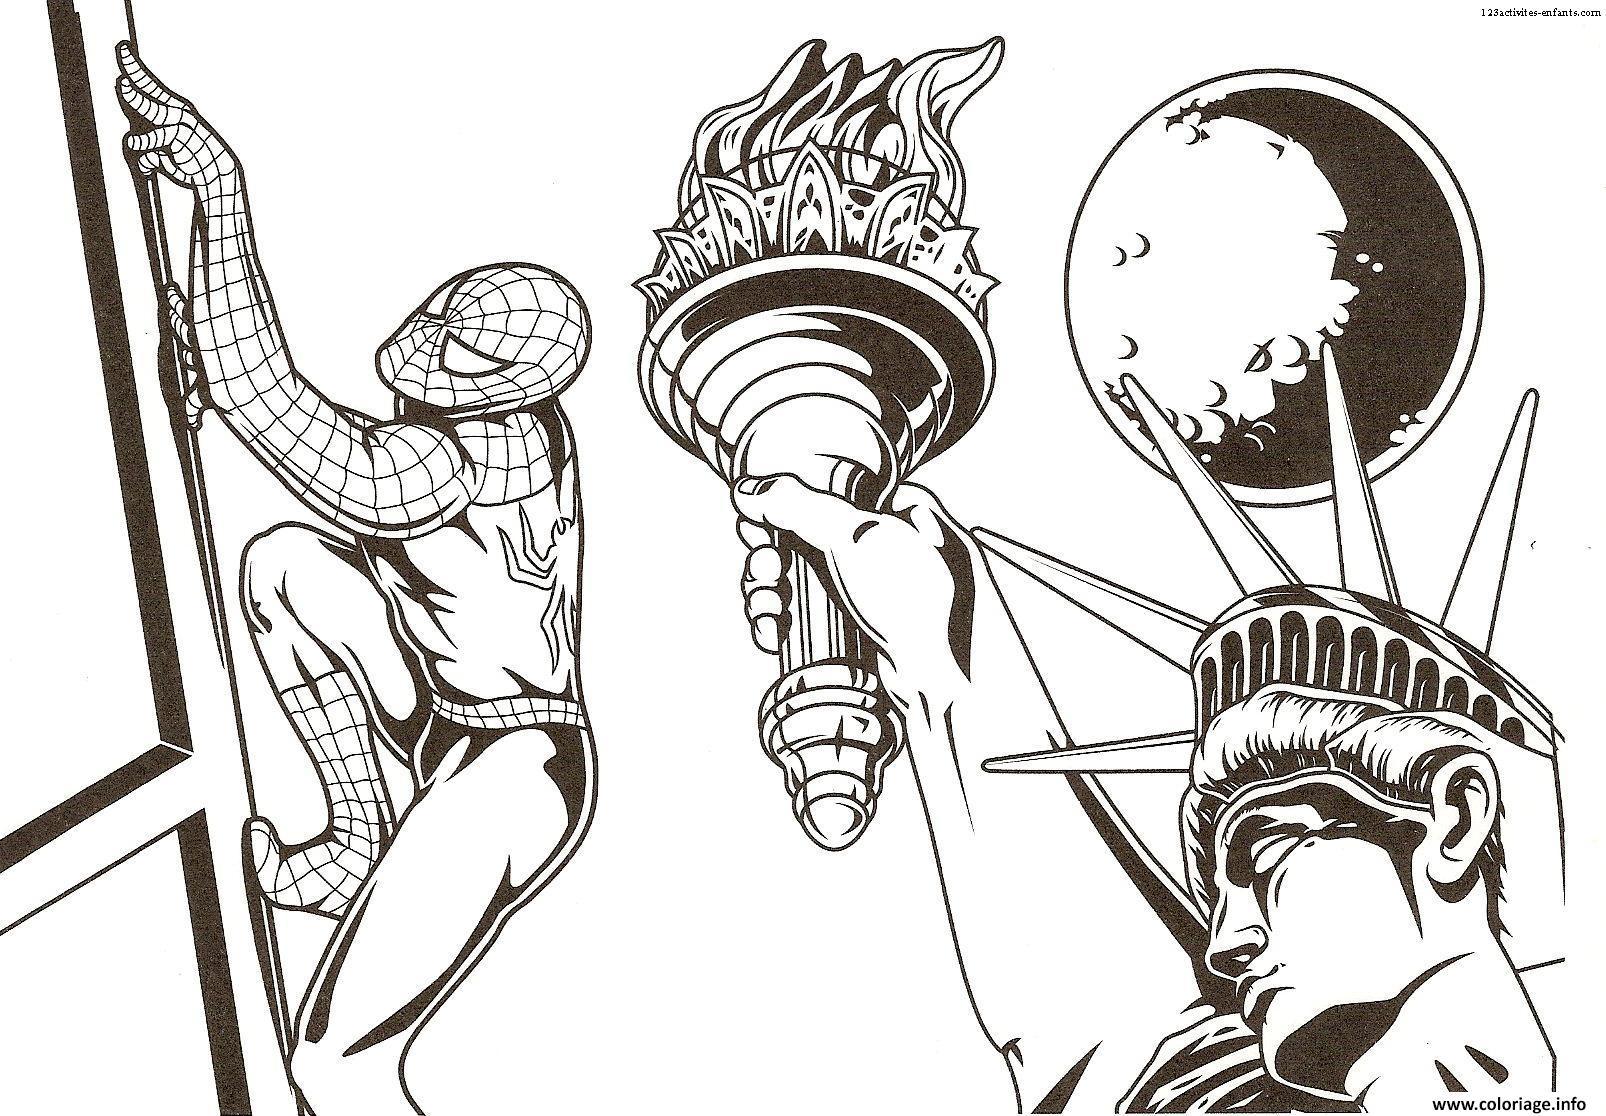 spiderman dans la ville de newyork avec la status de la liberte coloriage dessin